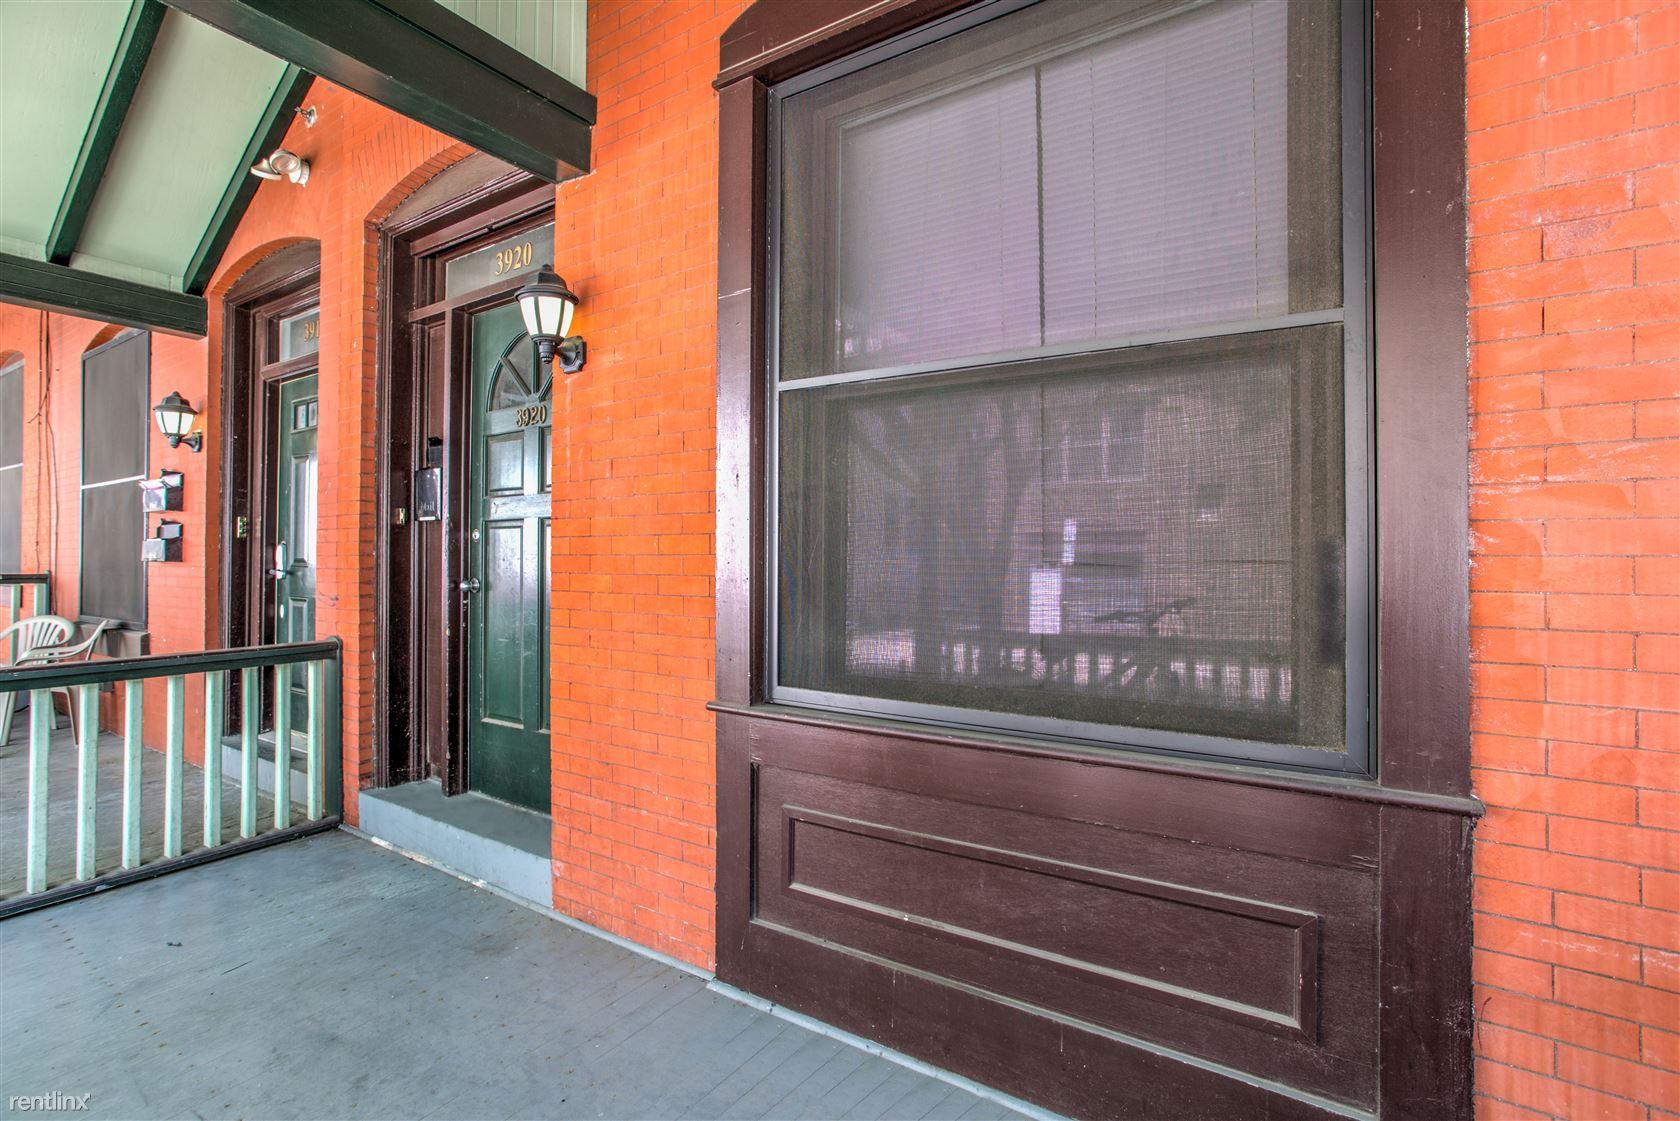 3920 Sansom St, Philadelphia, PA - $5,625 USD/ month